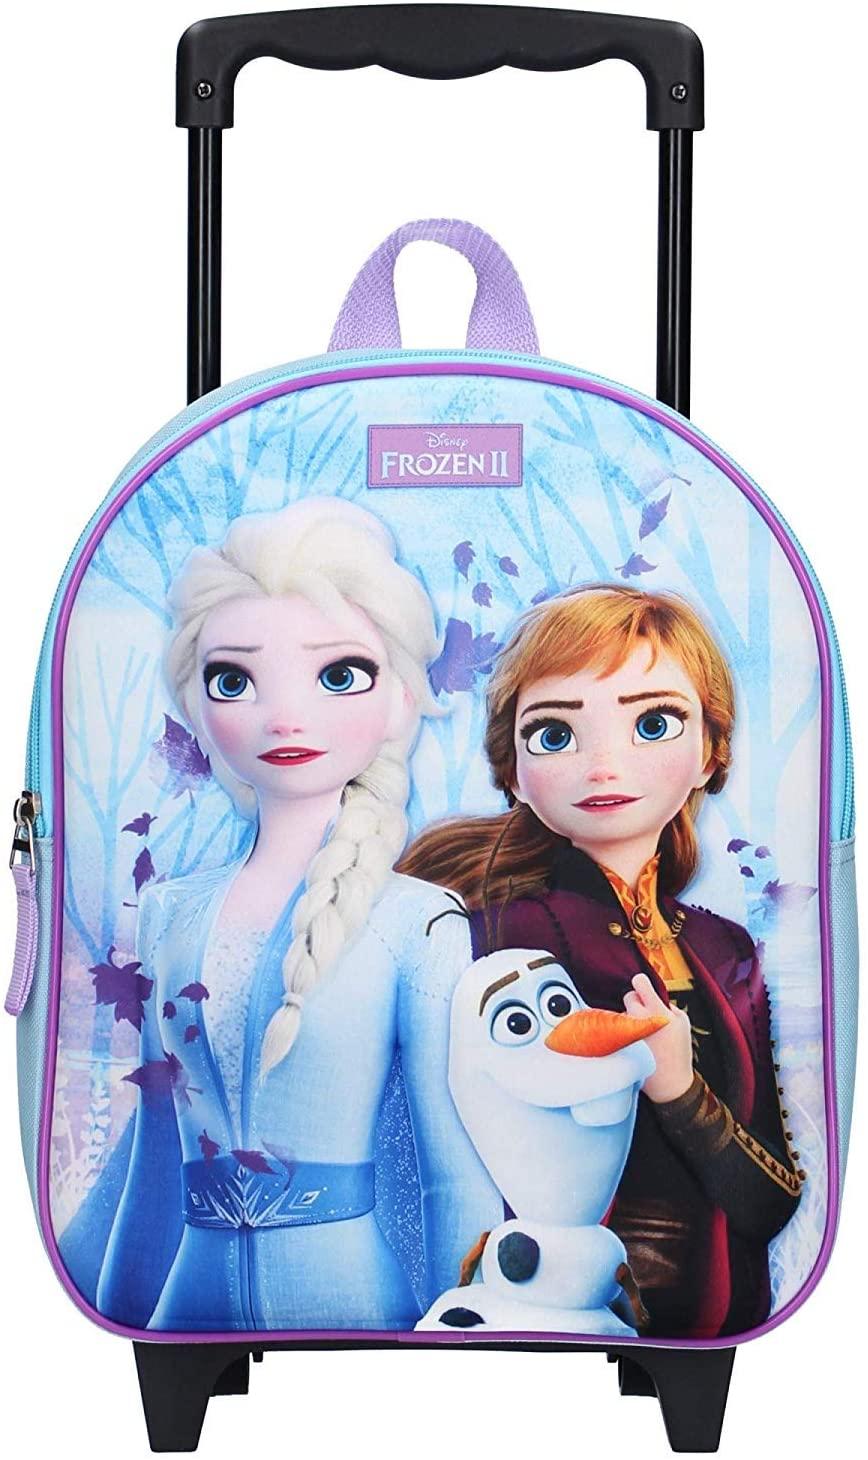 Frozen roulette backpack